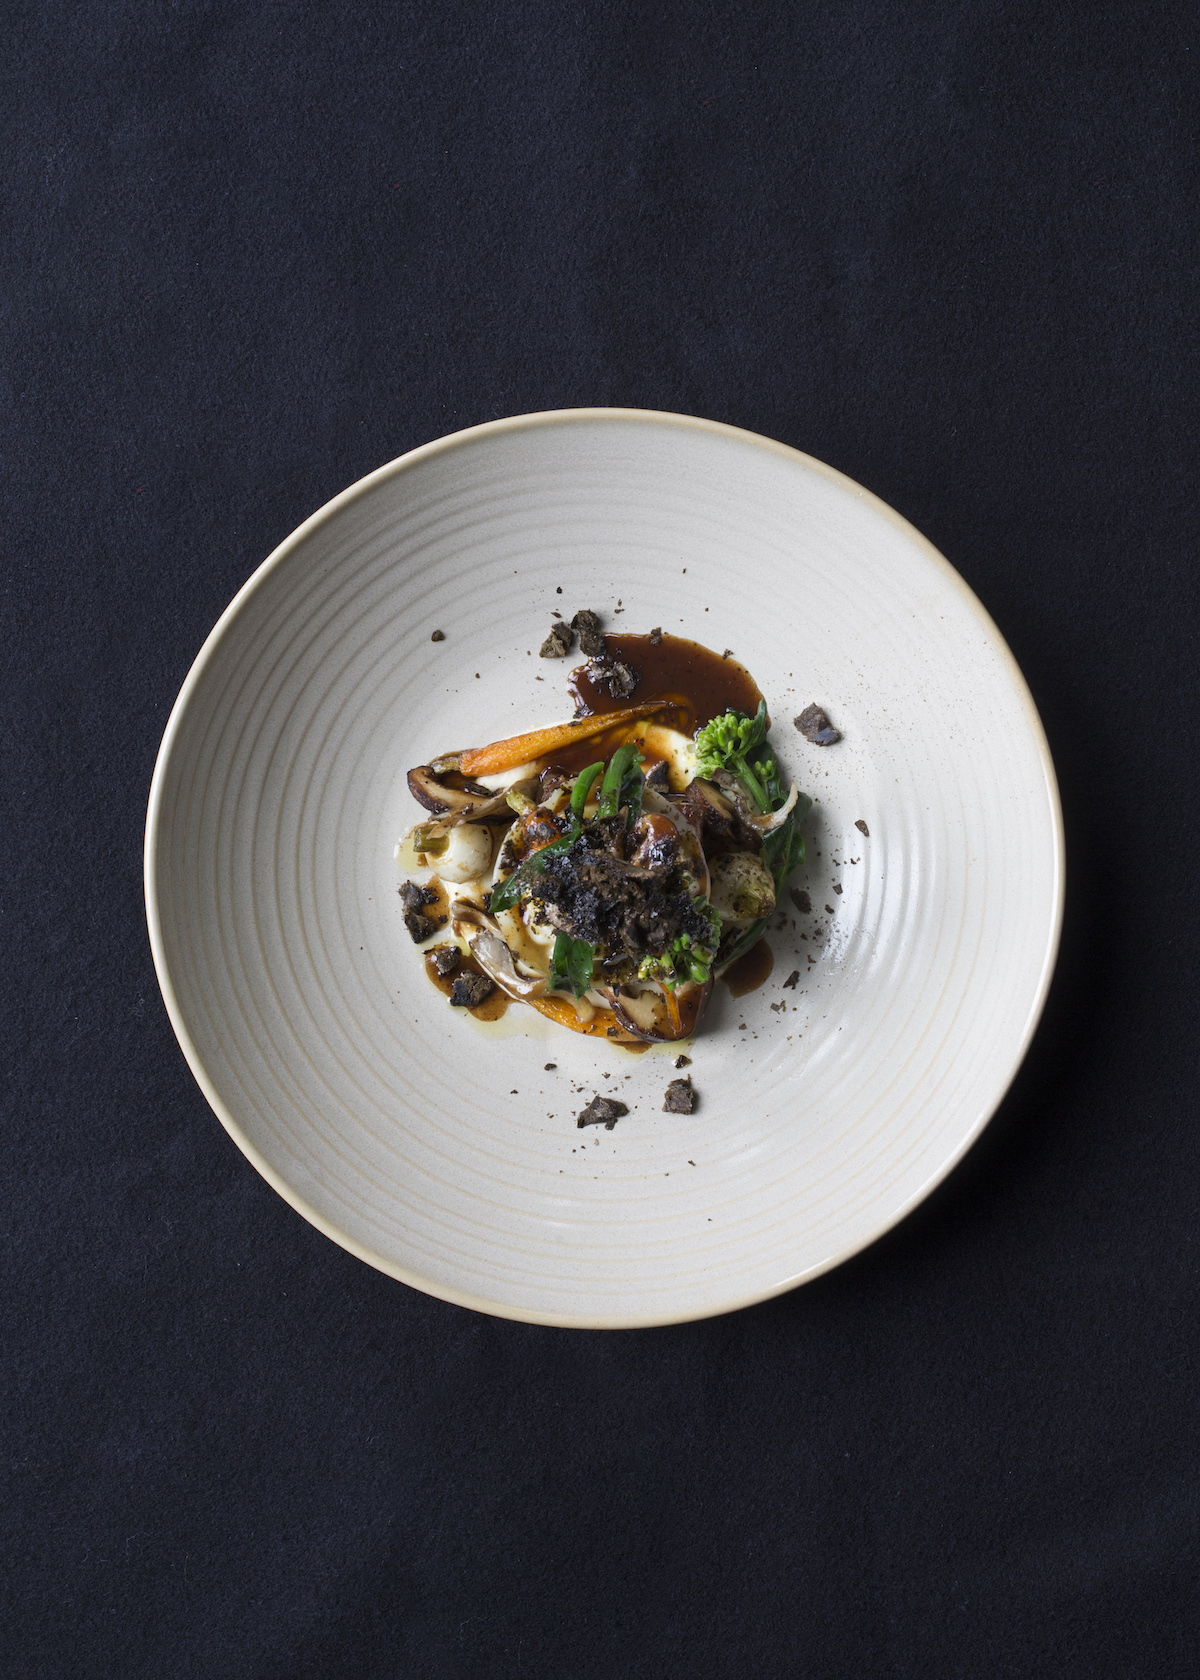 Palate Restaurant dish: Silver Fern Farms short rib, grilled tongue, smoked potato and liquorice.